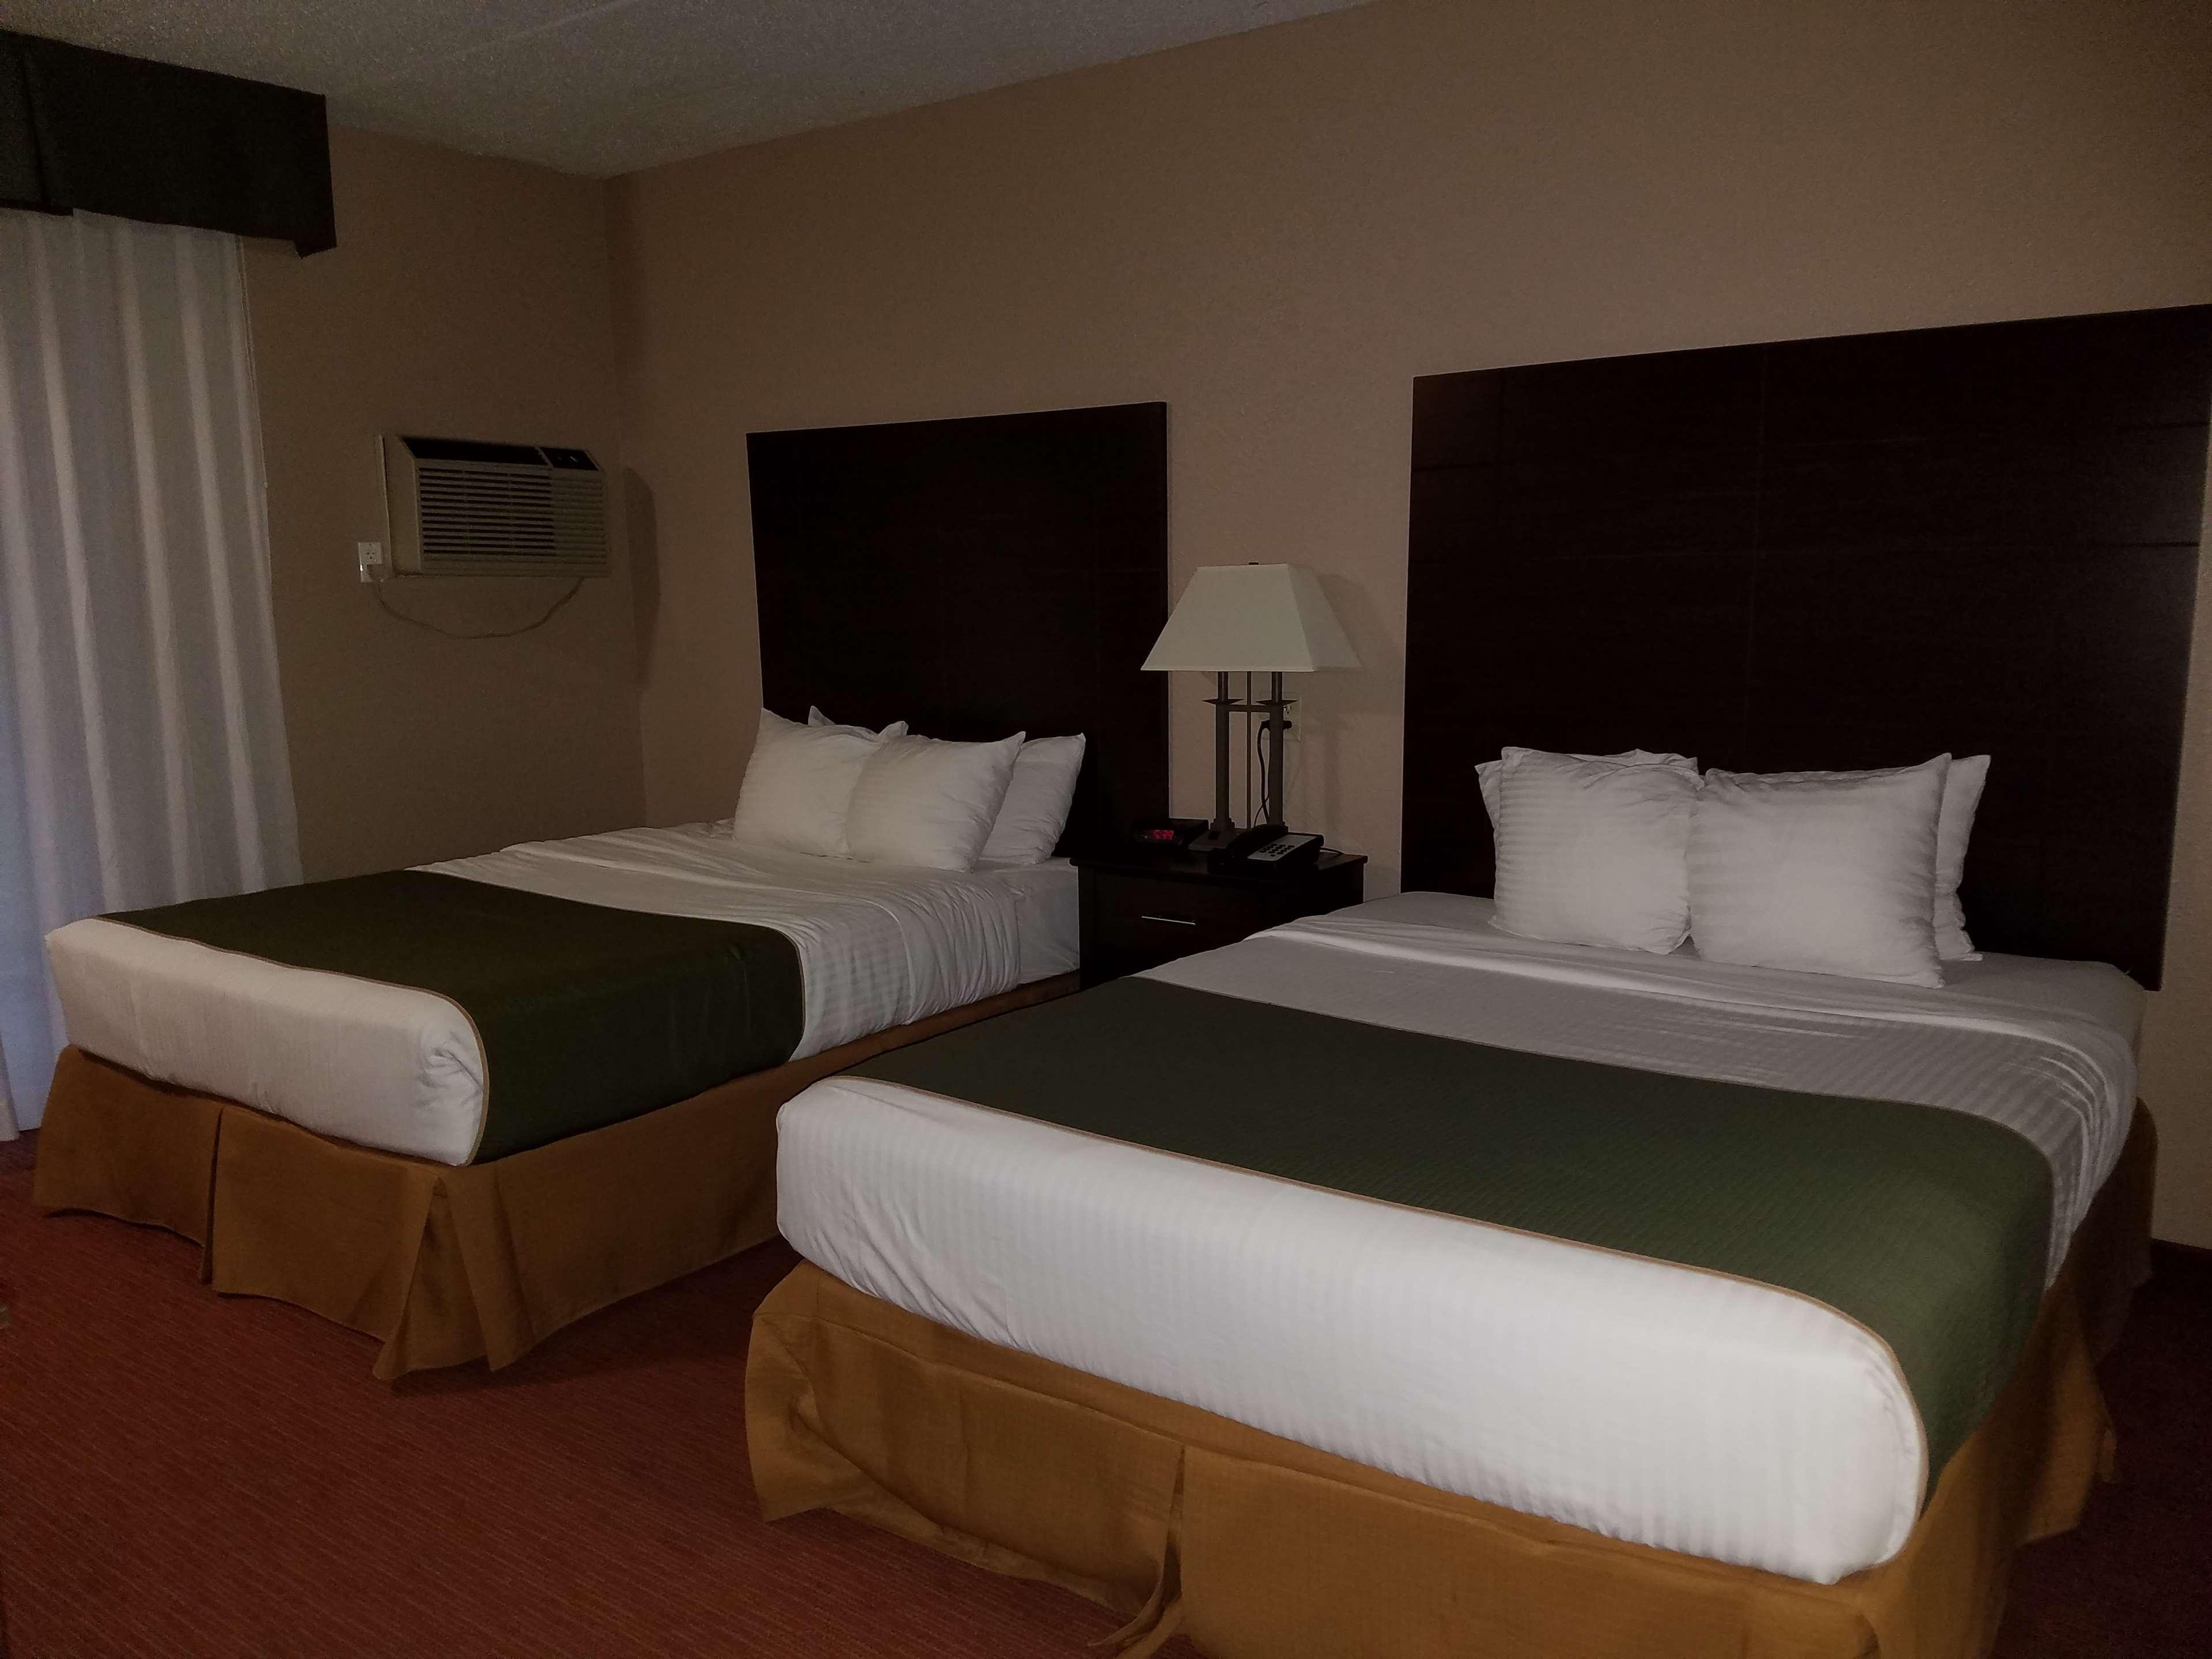 Best Western Valley Plaza Inn image 18